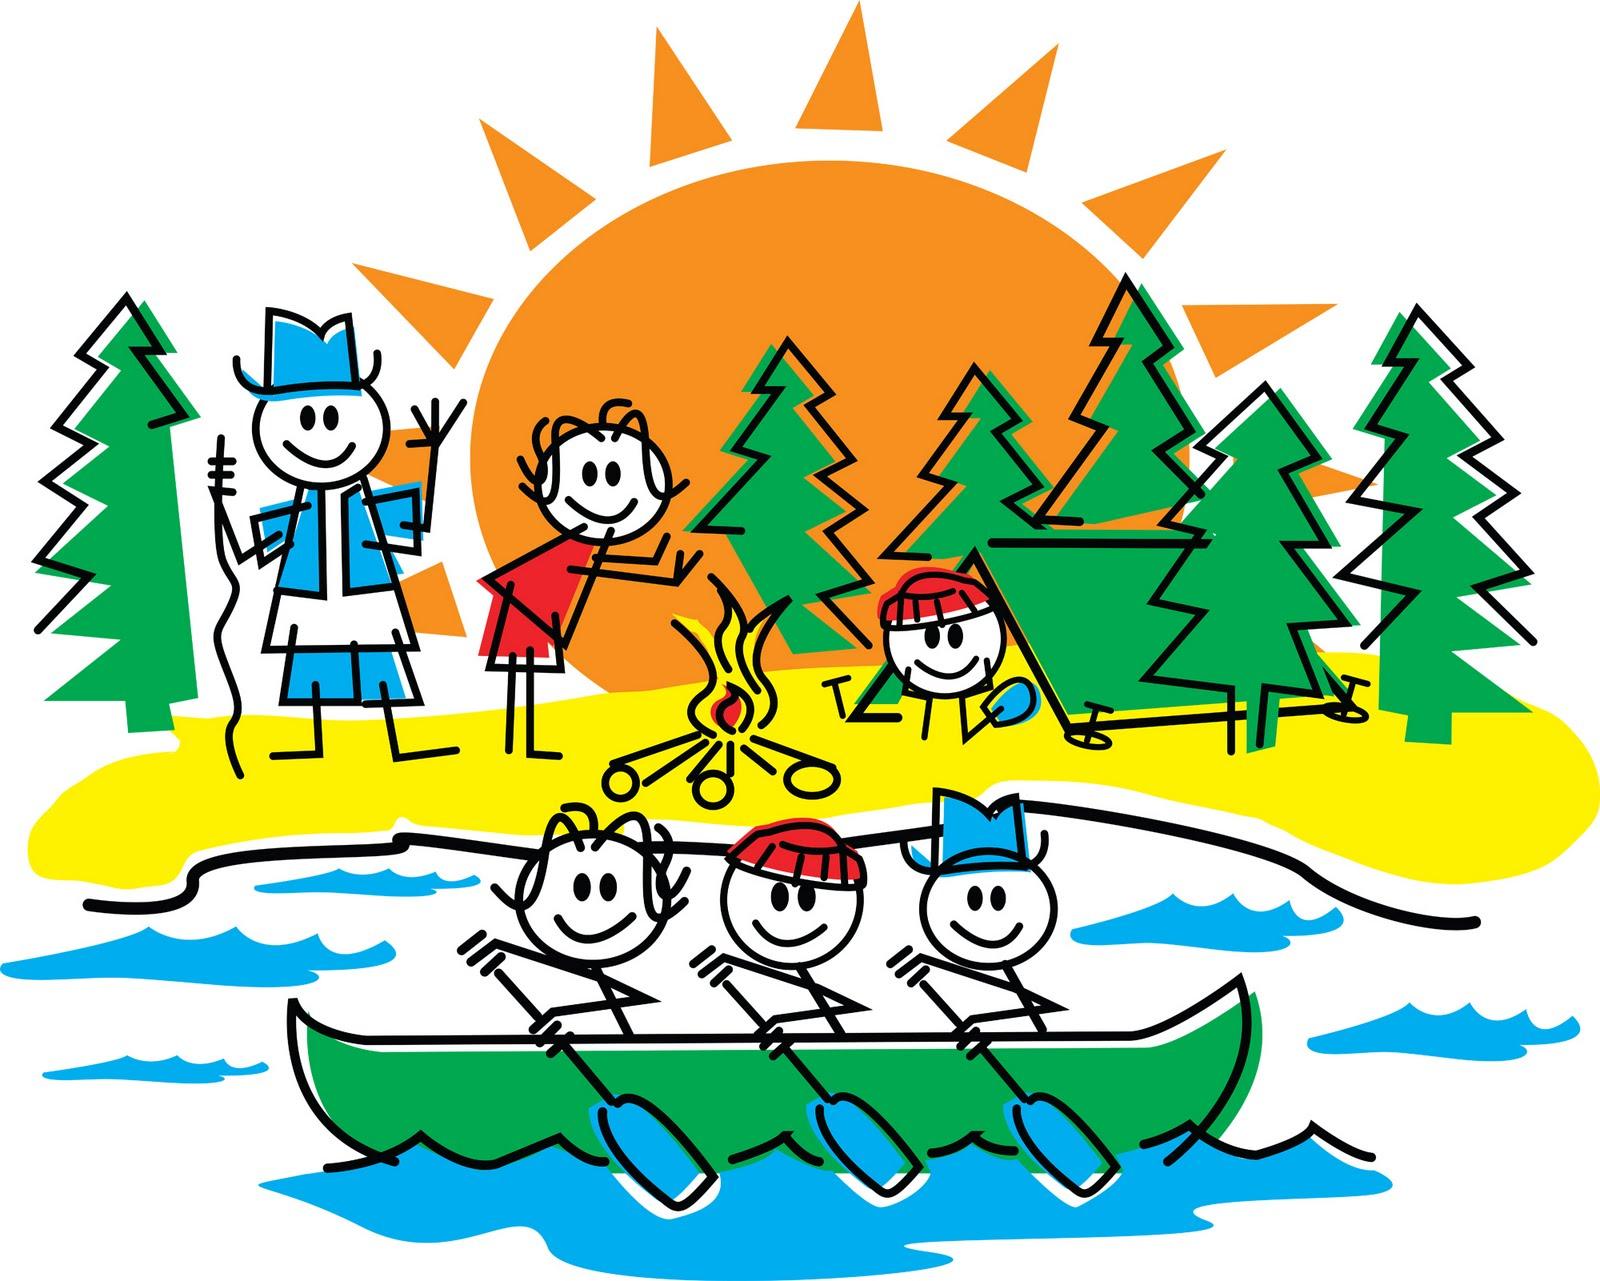 Adventure clipart school camp I Summer Marina Marina 30%